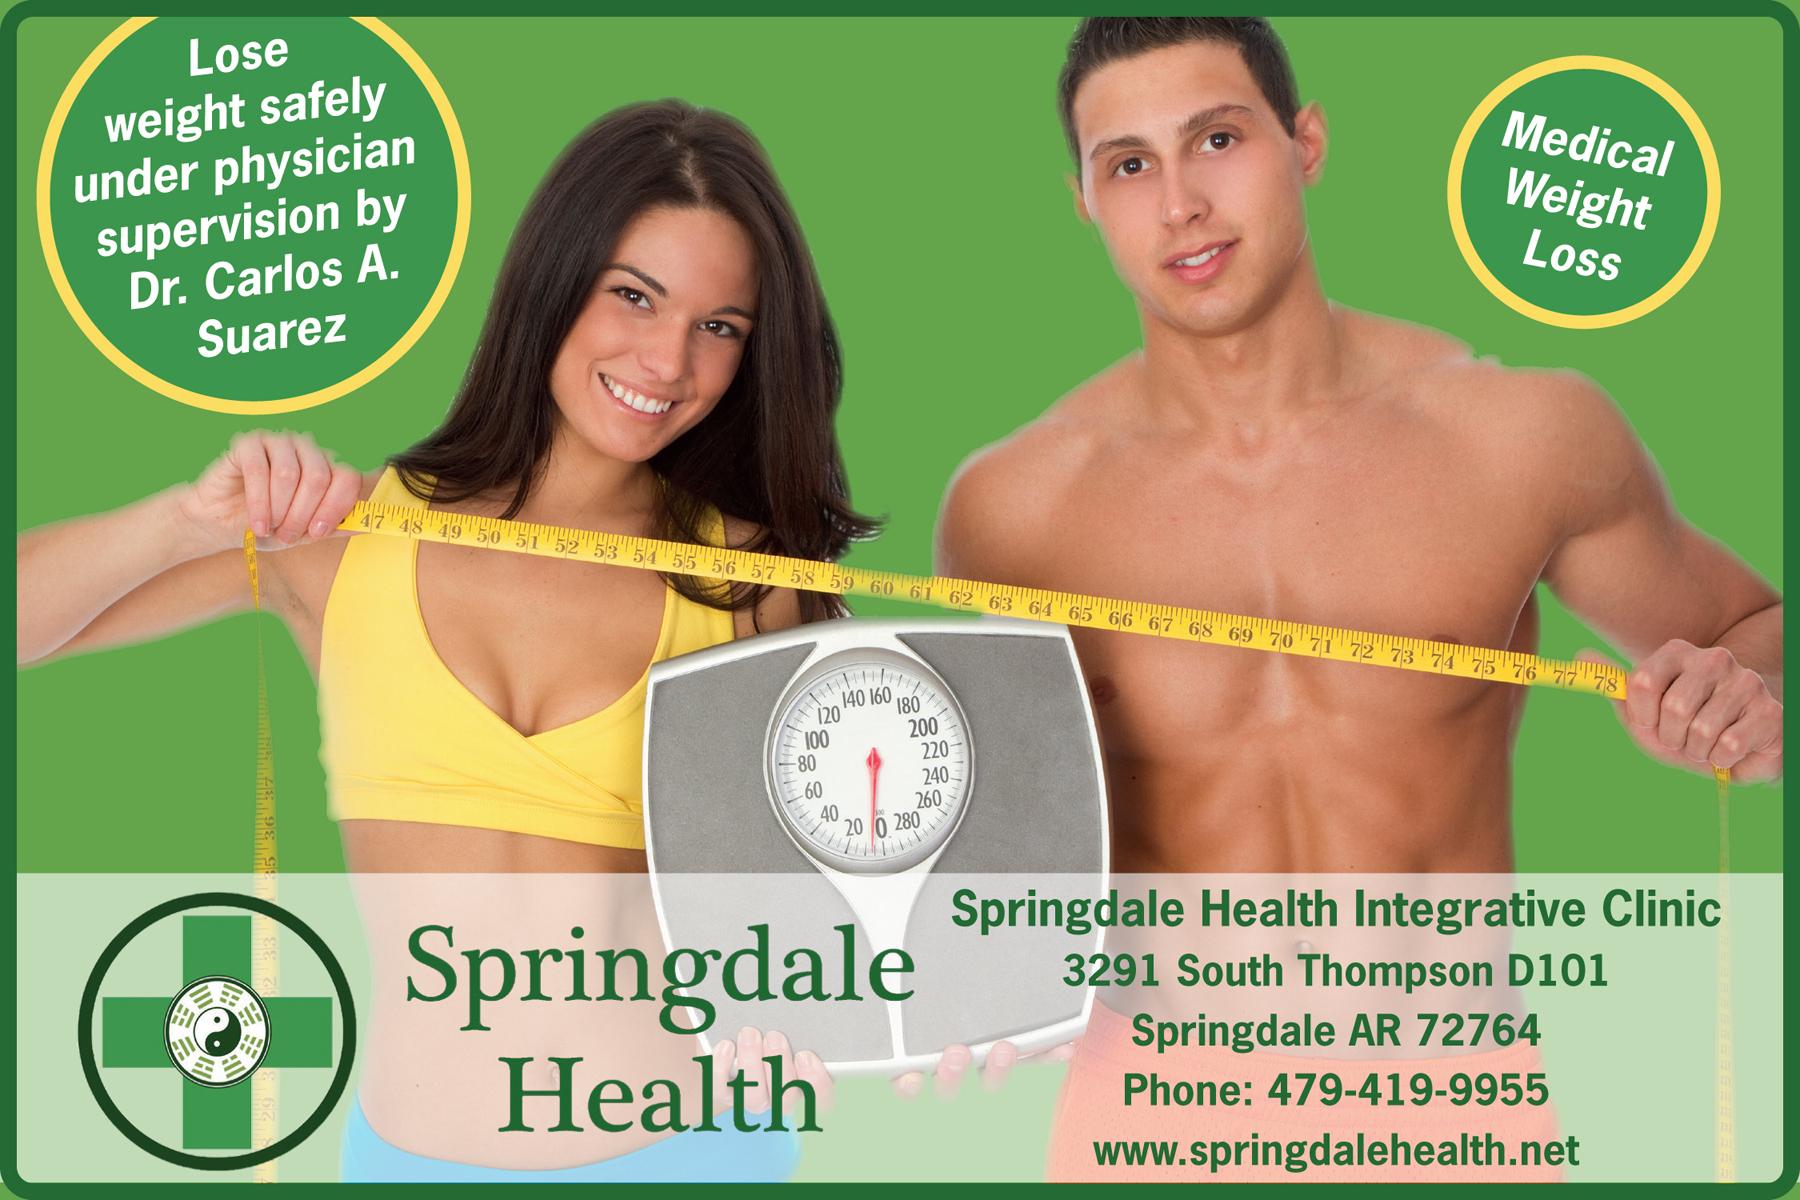 Springdale Health Integrative Clinic_12_Jun